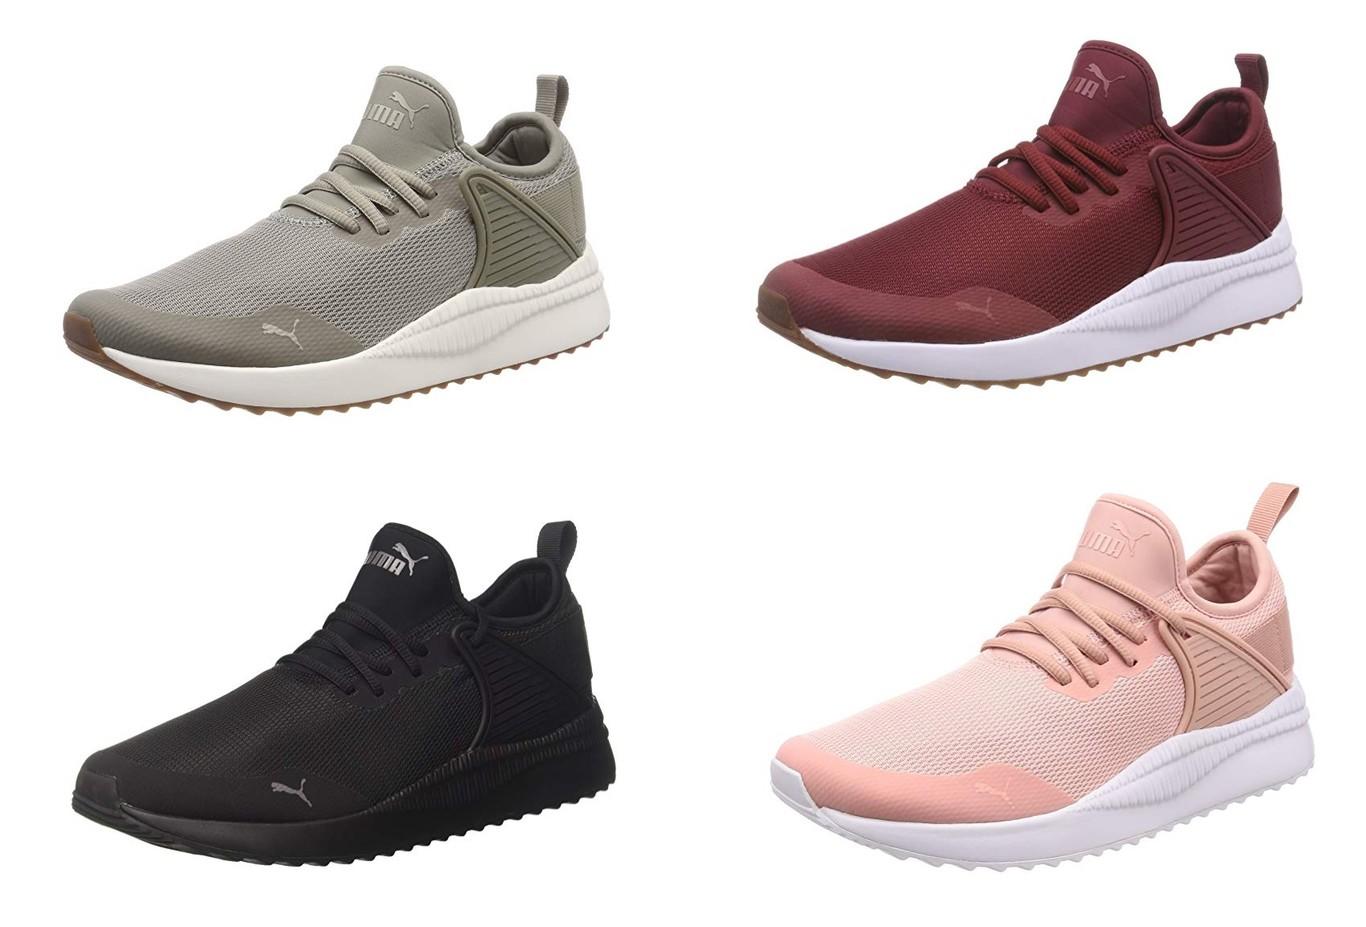 brand new 77448 9b536 Desde 36,33 euros podemos hacernos con estas zapatillas Puma Pacer Next  Cage gracias a Amazon